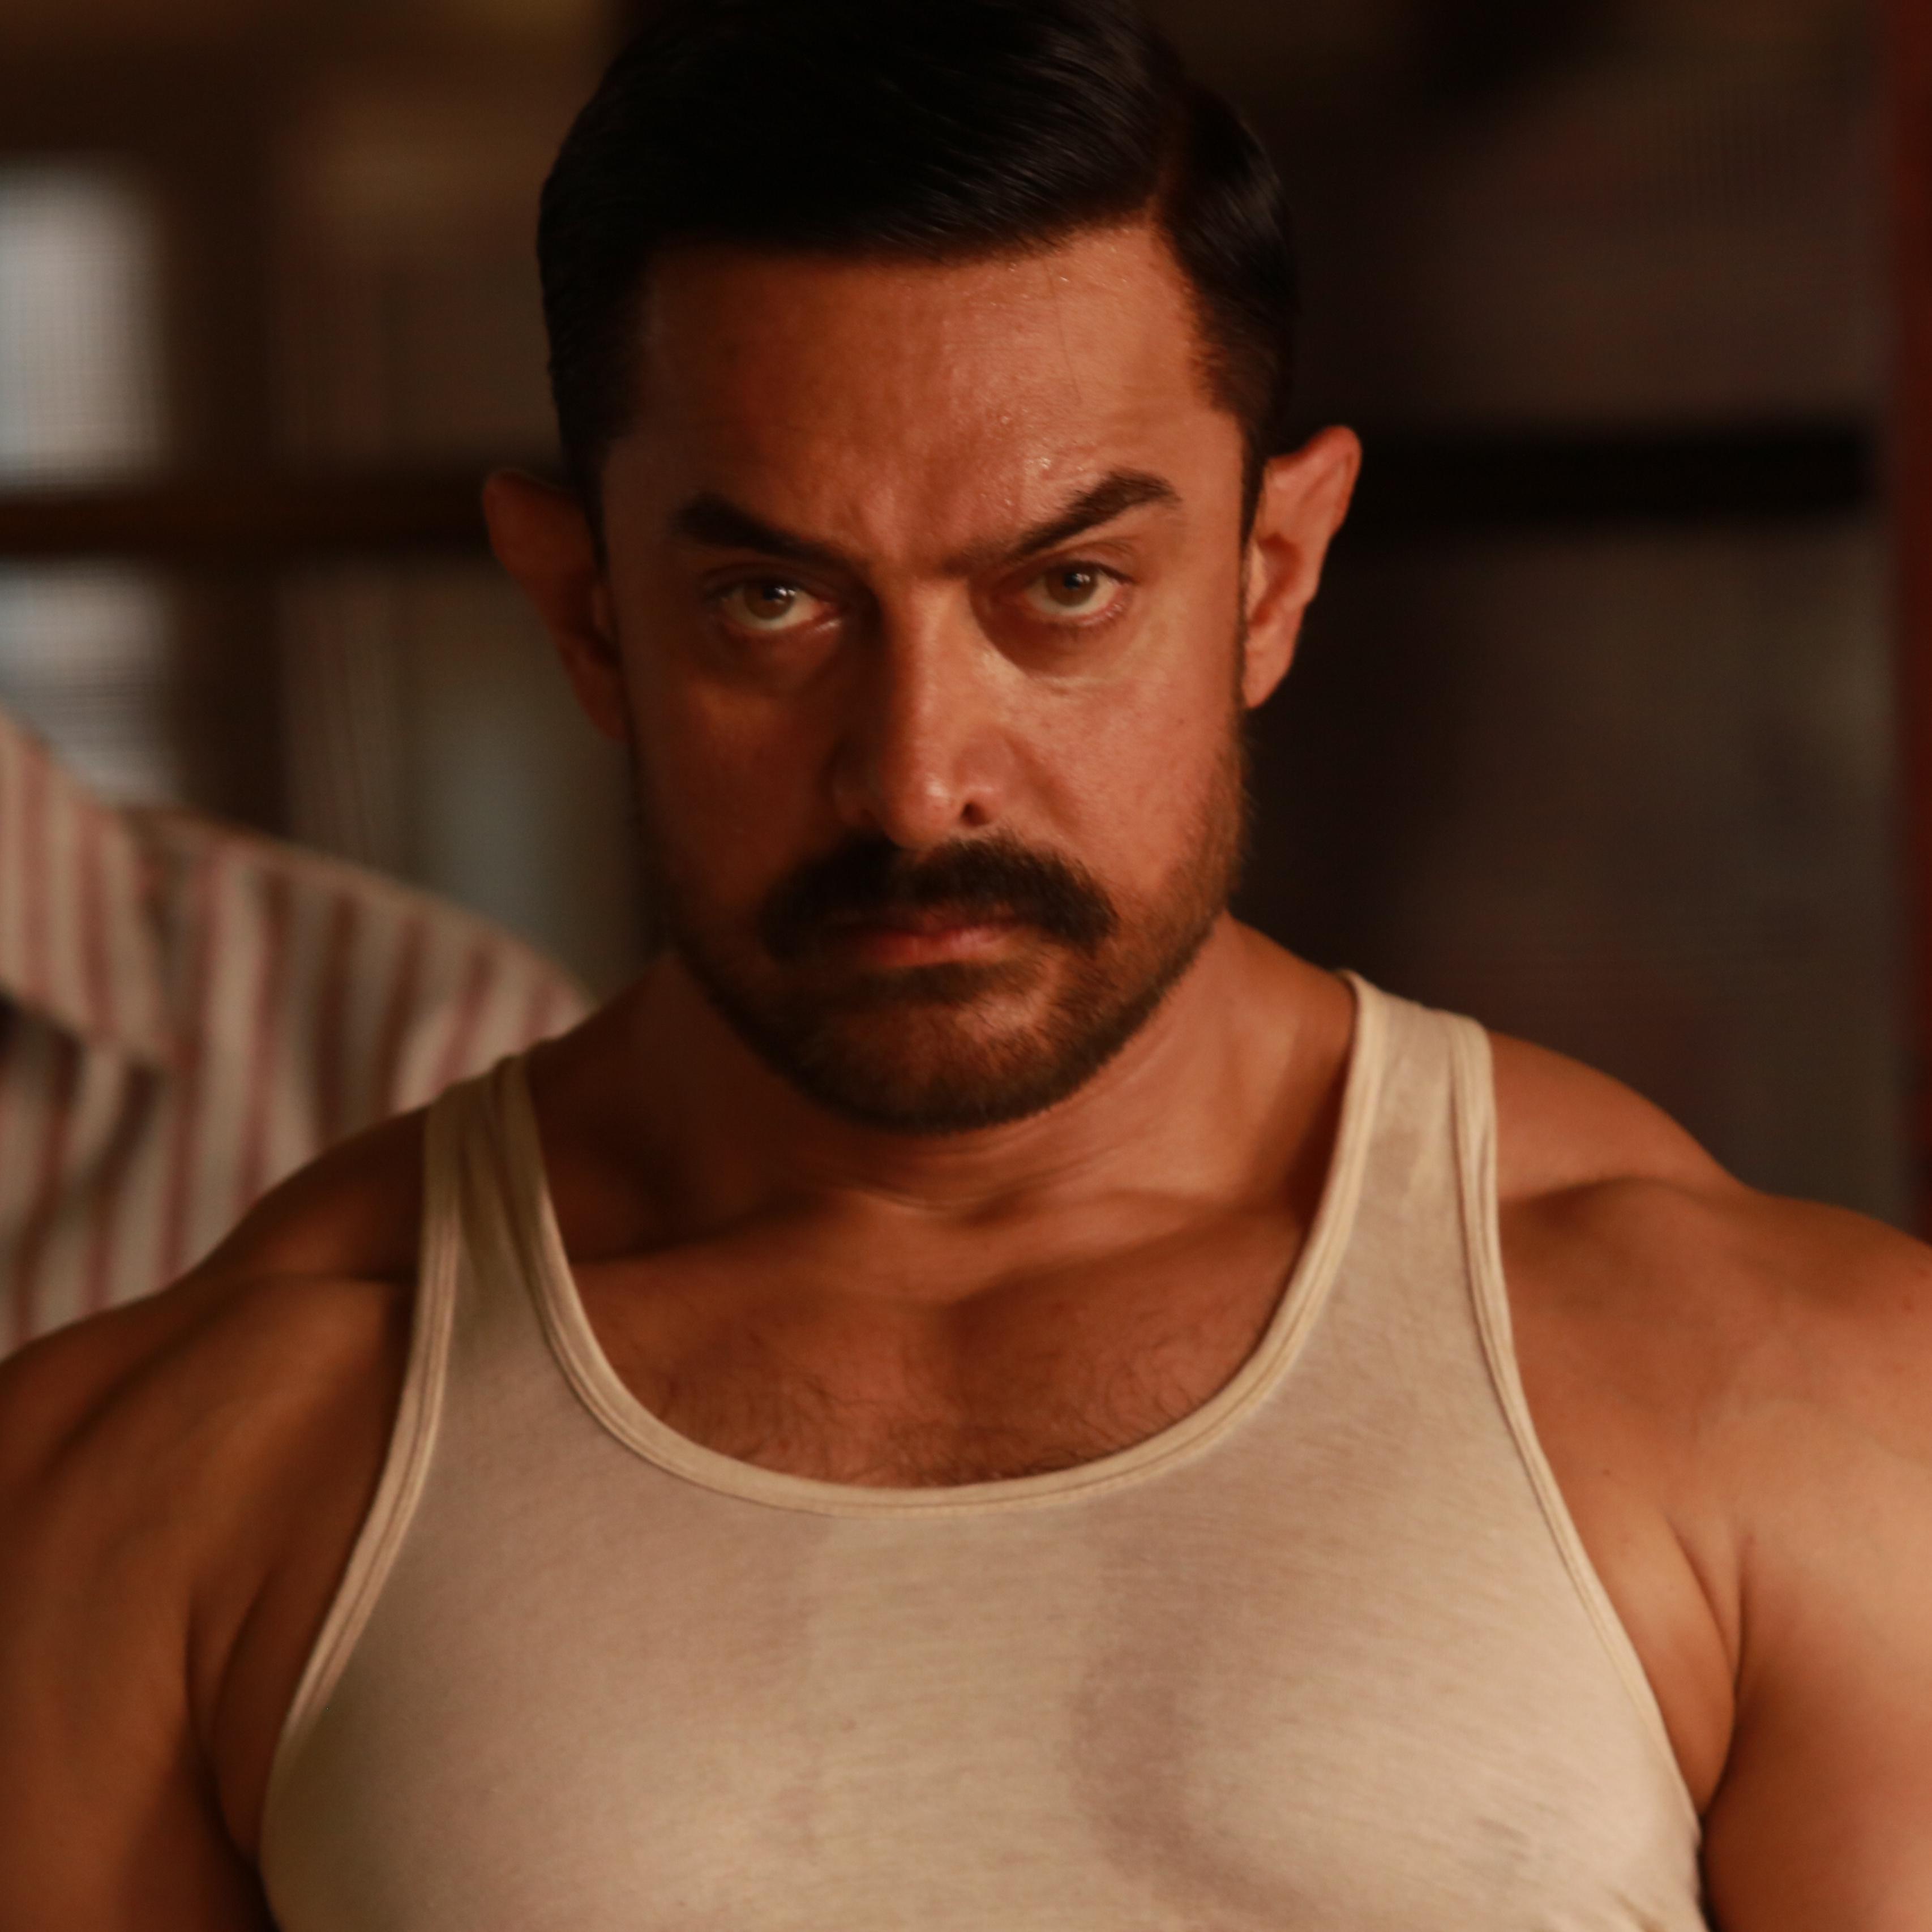 Bollywood Actor Aamir Khan Photos HD Wallpapers Download 3413x3413